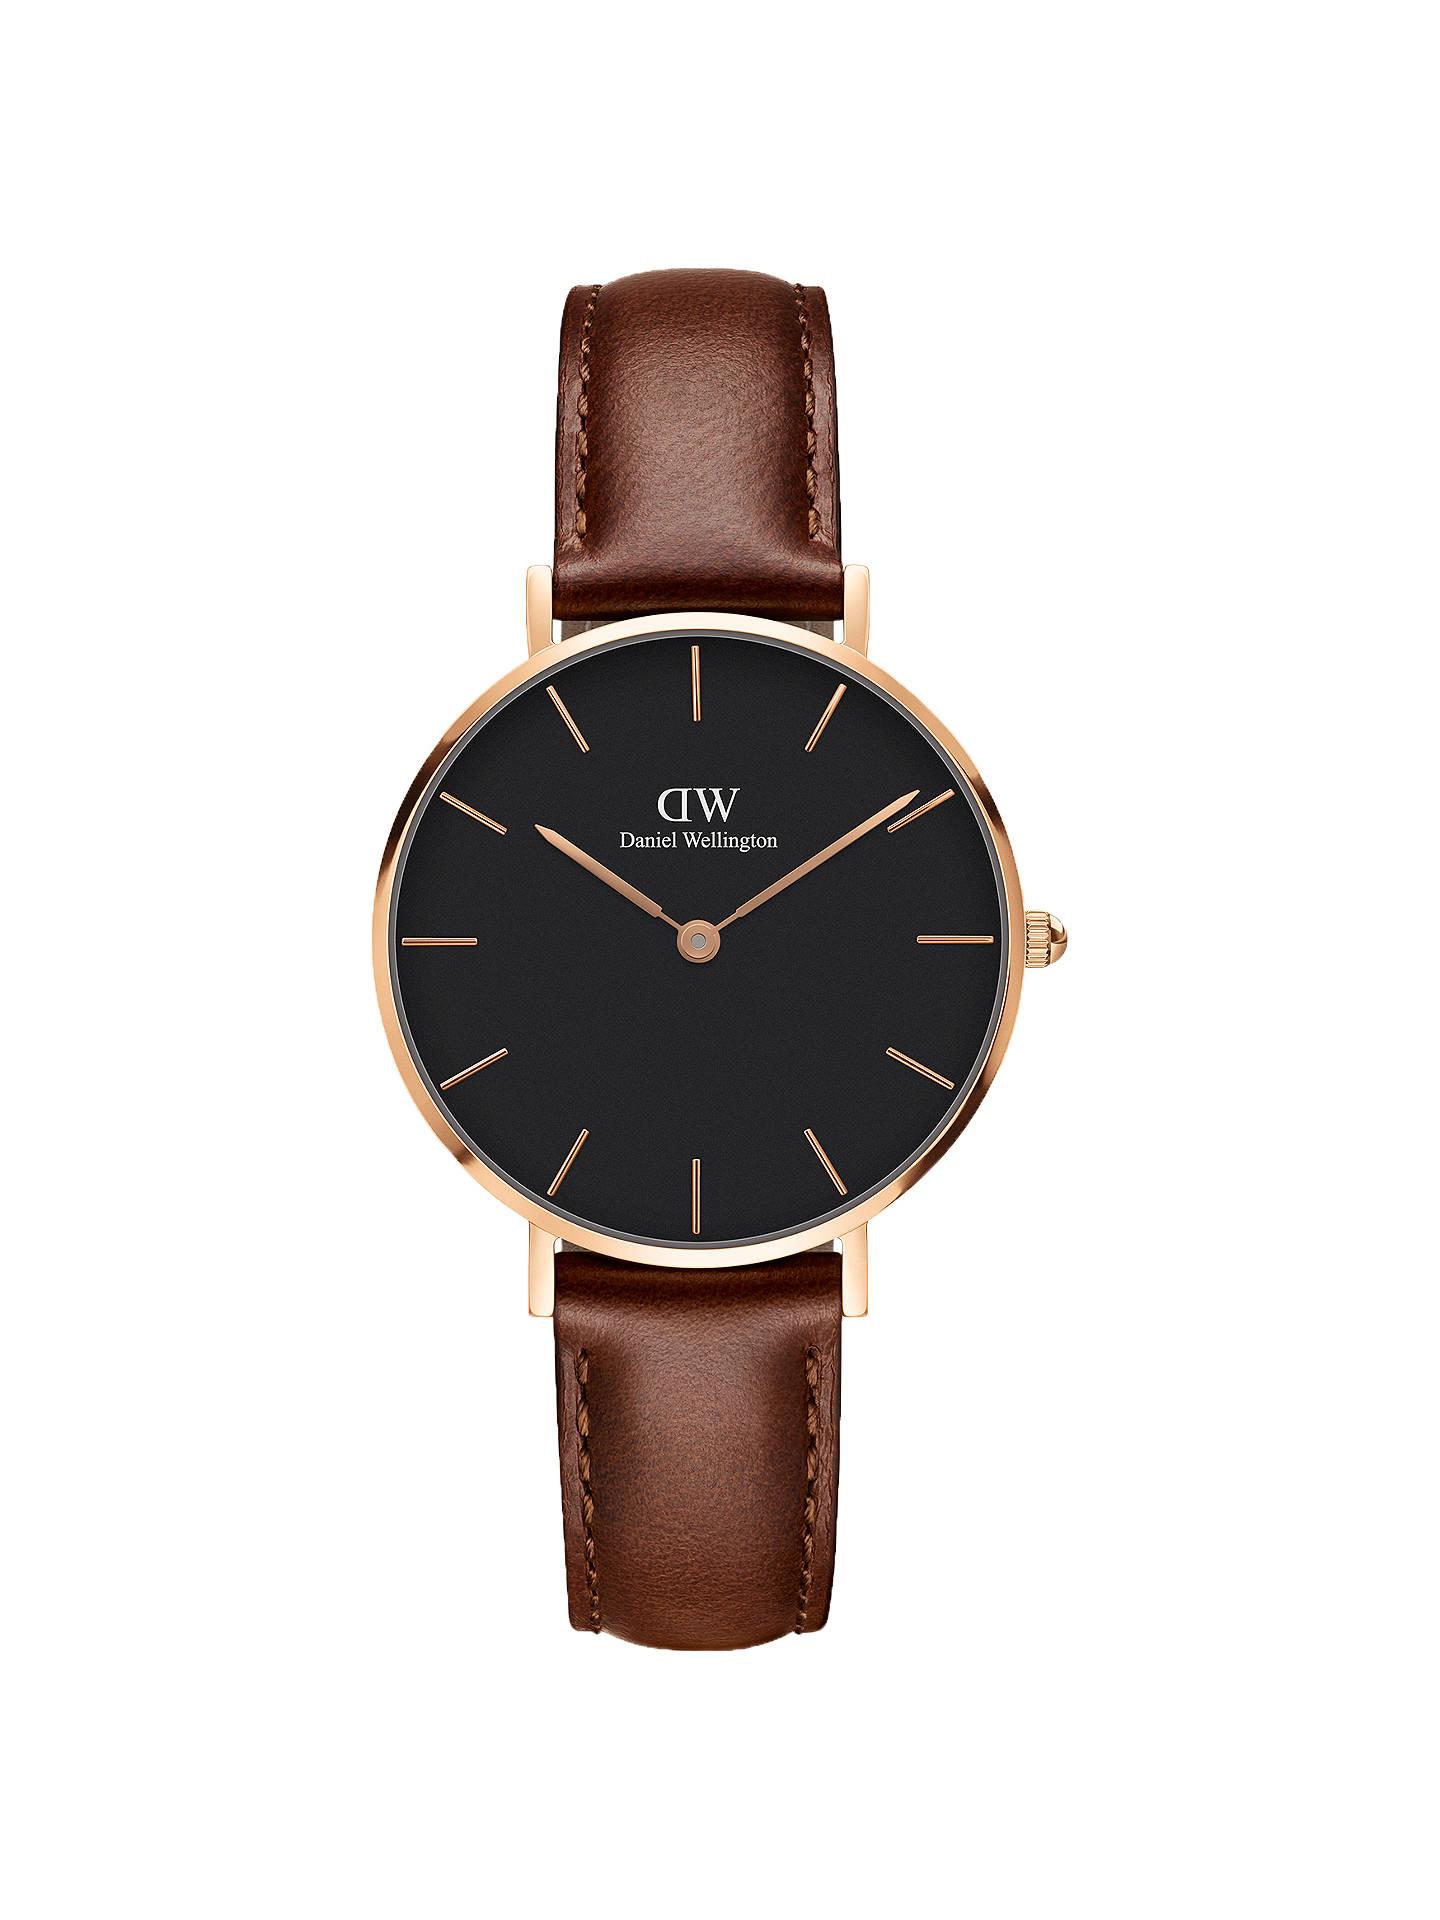 392576f1b Buy Daniel Wellington DW00100169 Women's Petite Leather Strap Watch, Brown/ Black Online at johnlewis